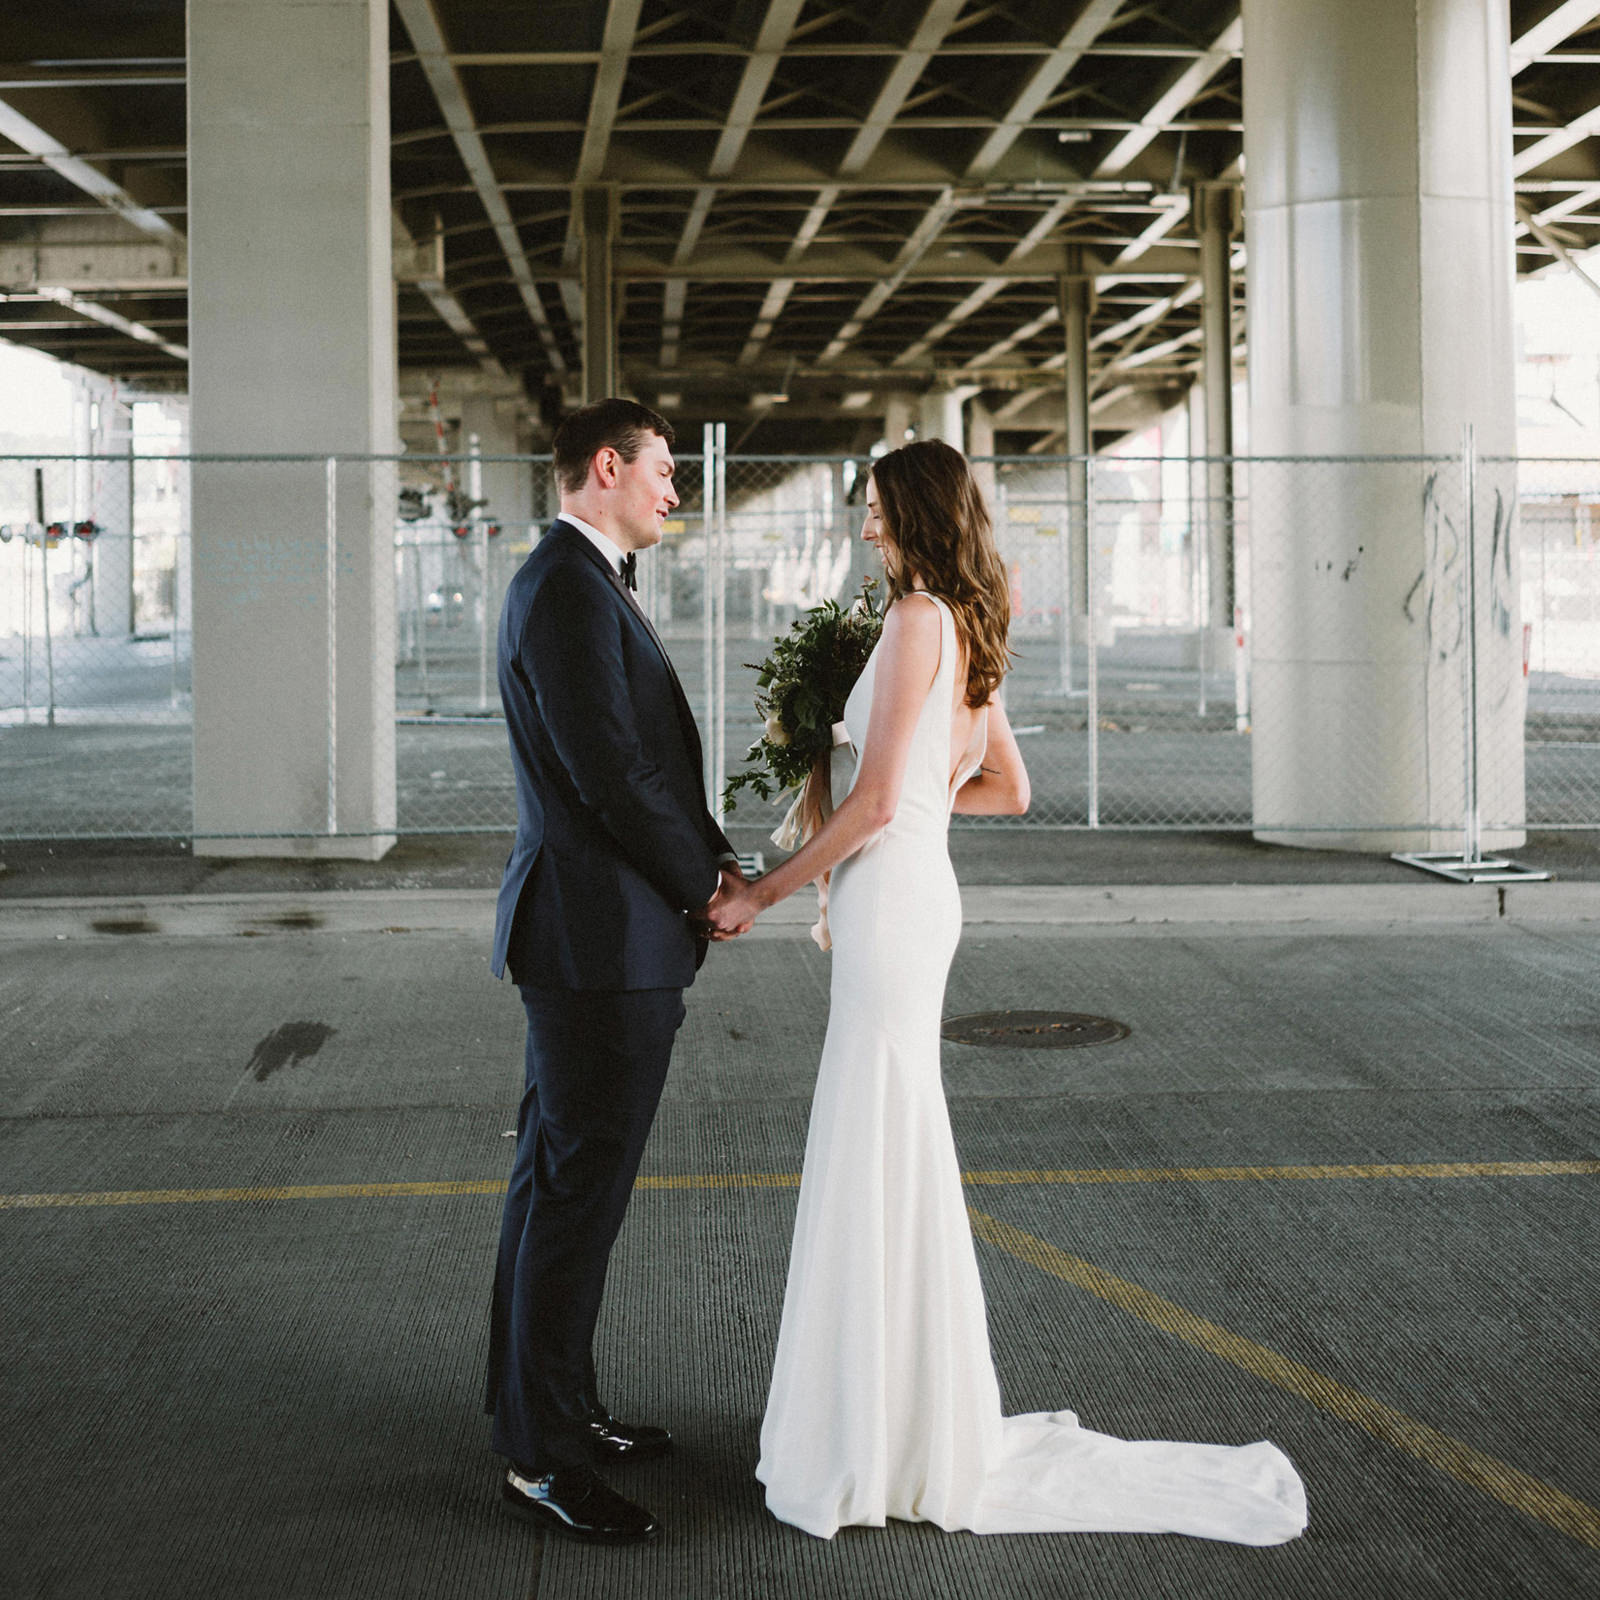 sodo-park-wedding-016 SODO PARK WEDDING